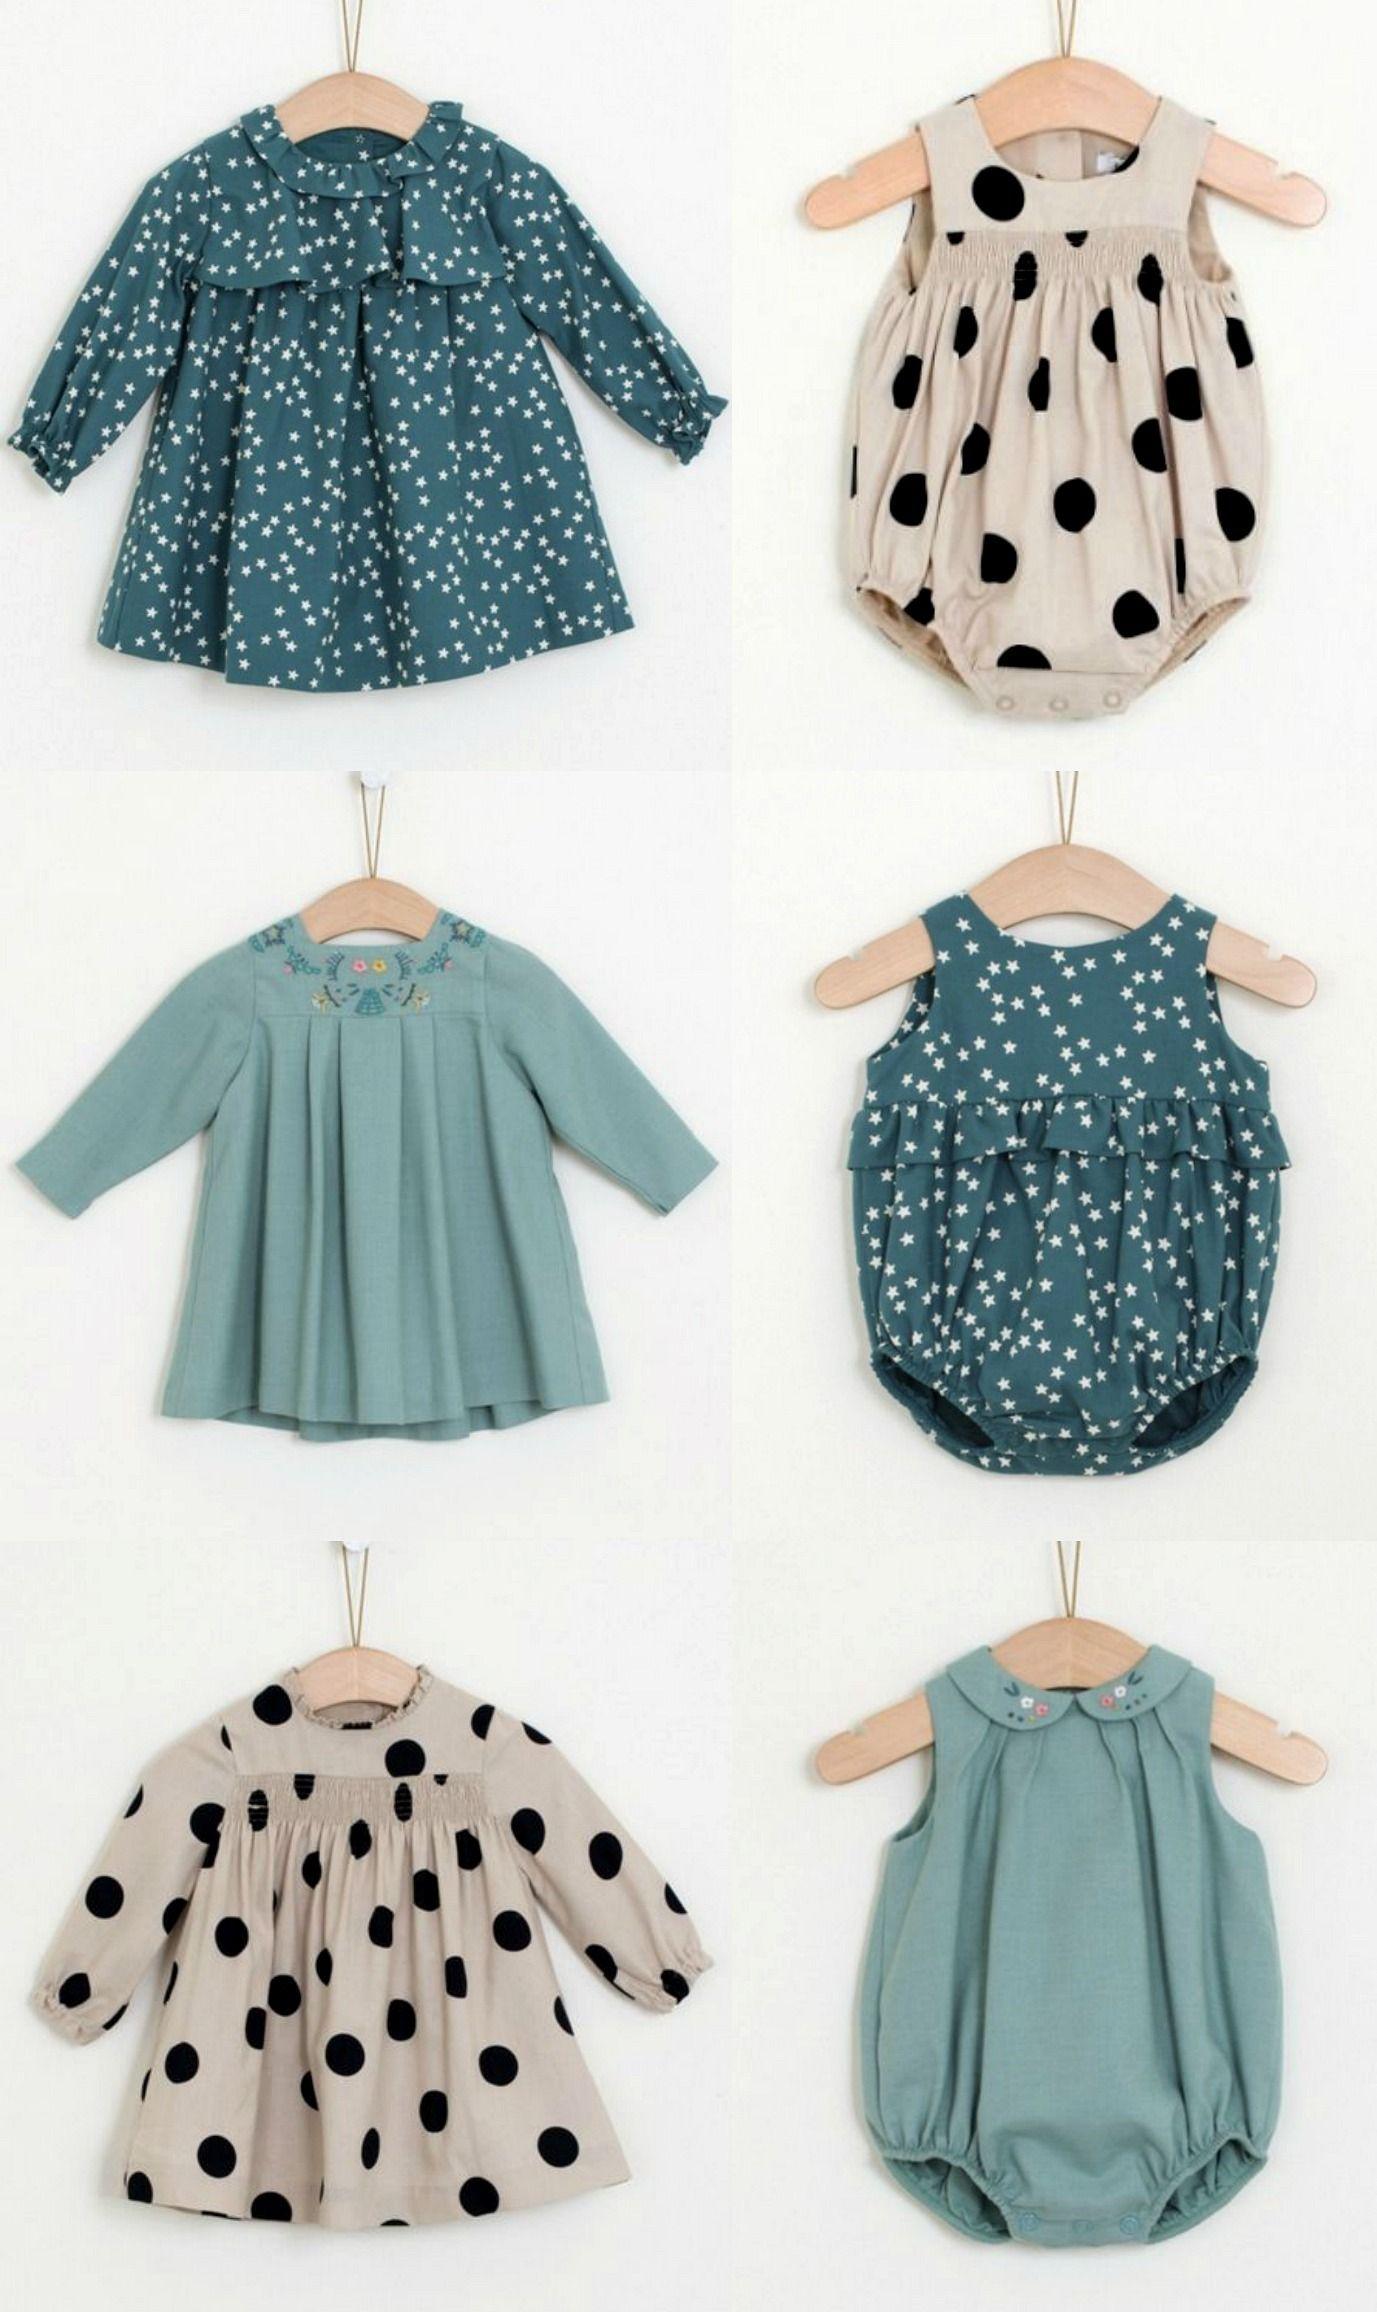 Toddler boy dress clothes for wedding  Knot Kids  Sewing Stitches u Materials  Pinterest  Babies